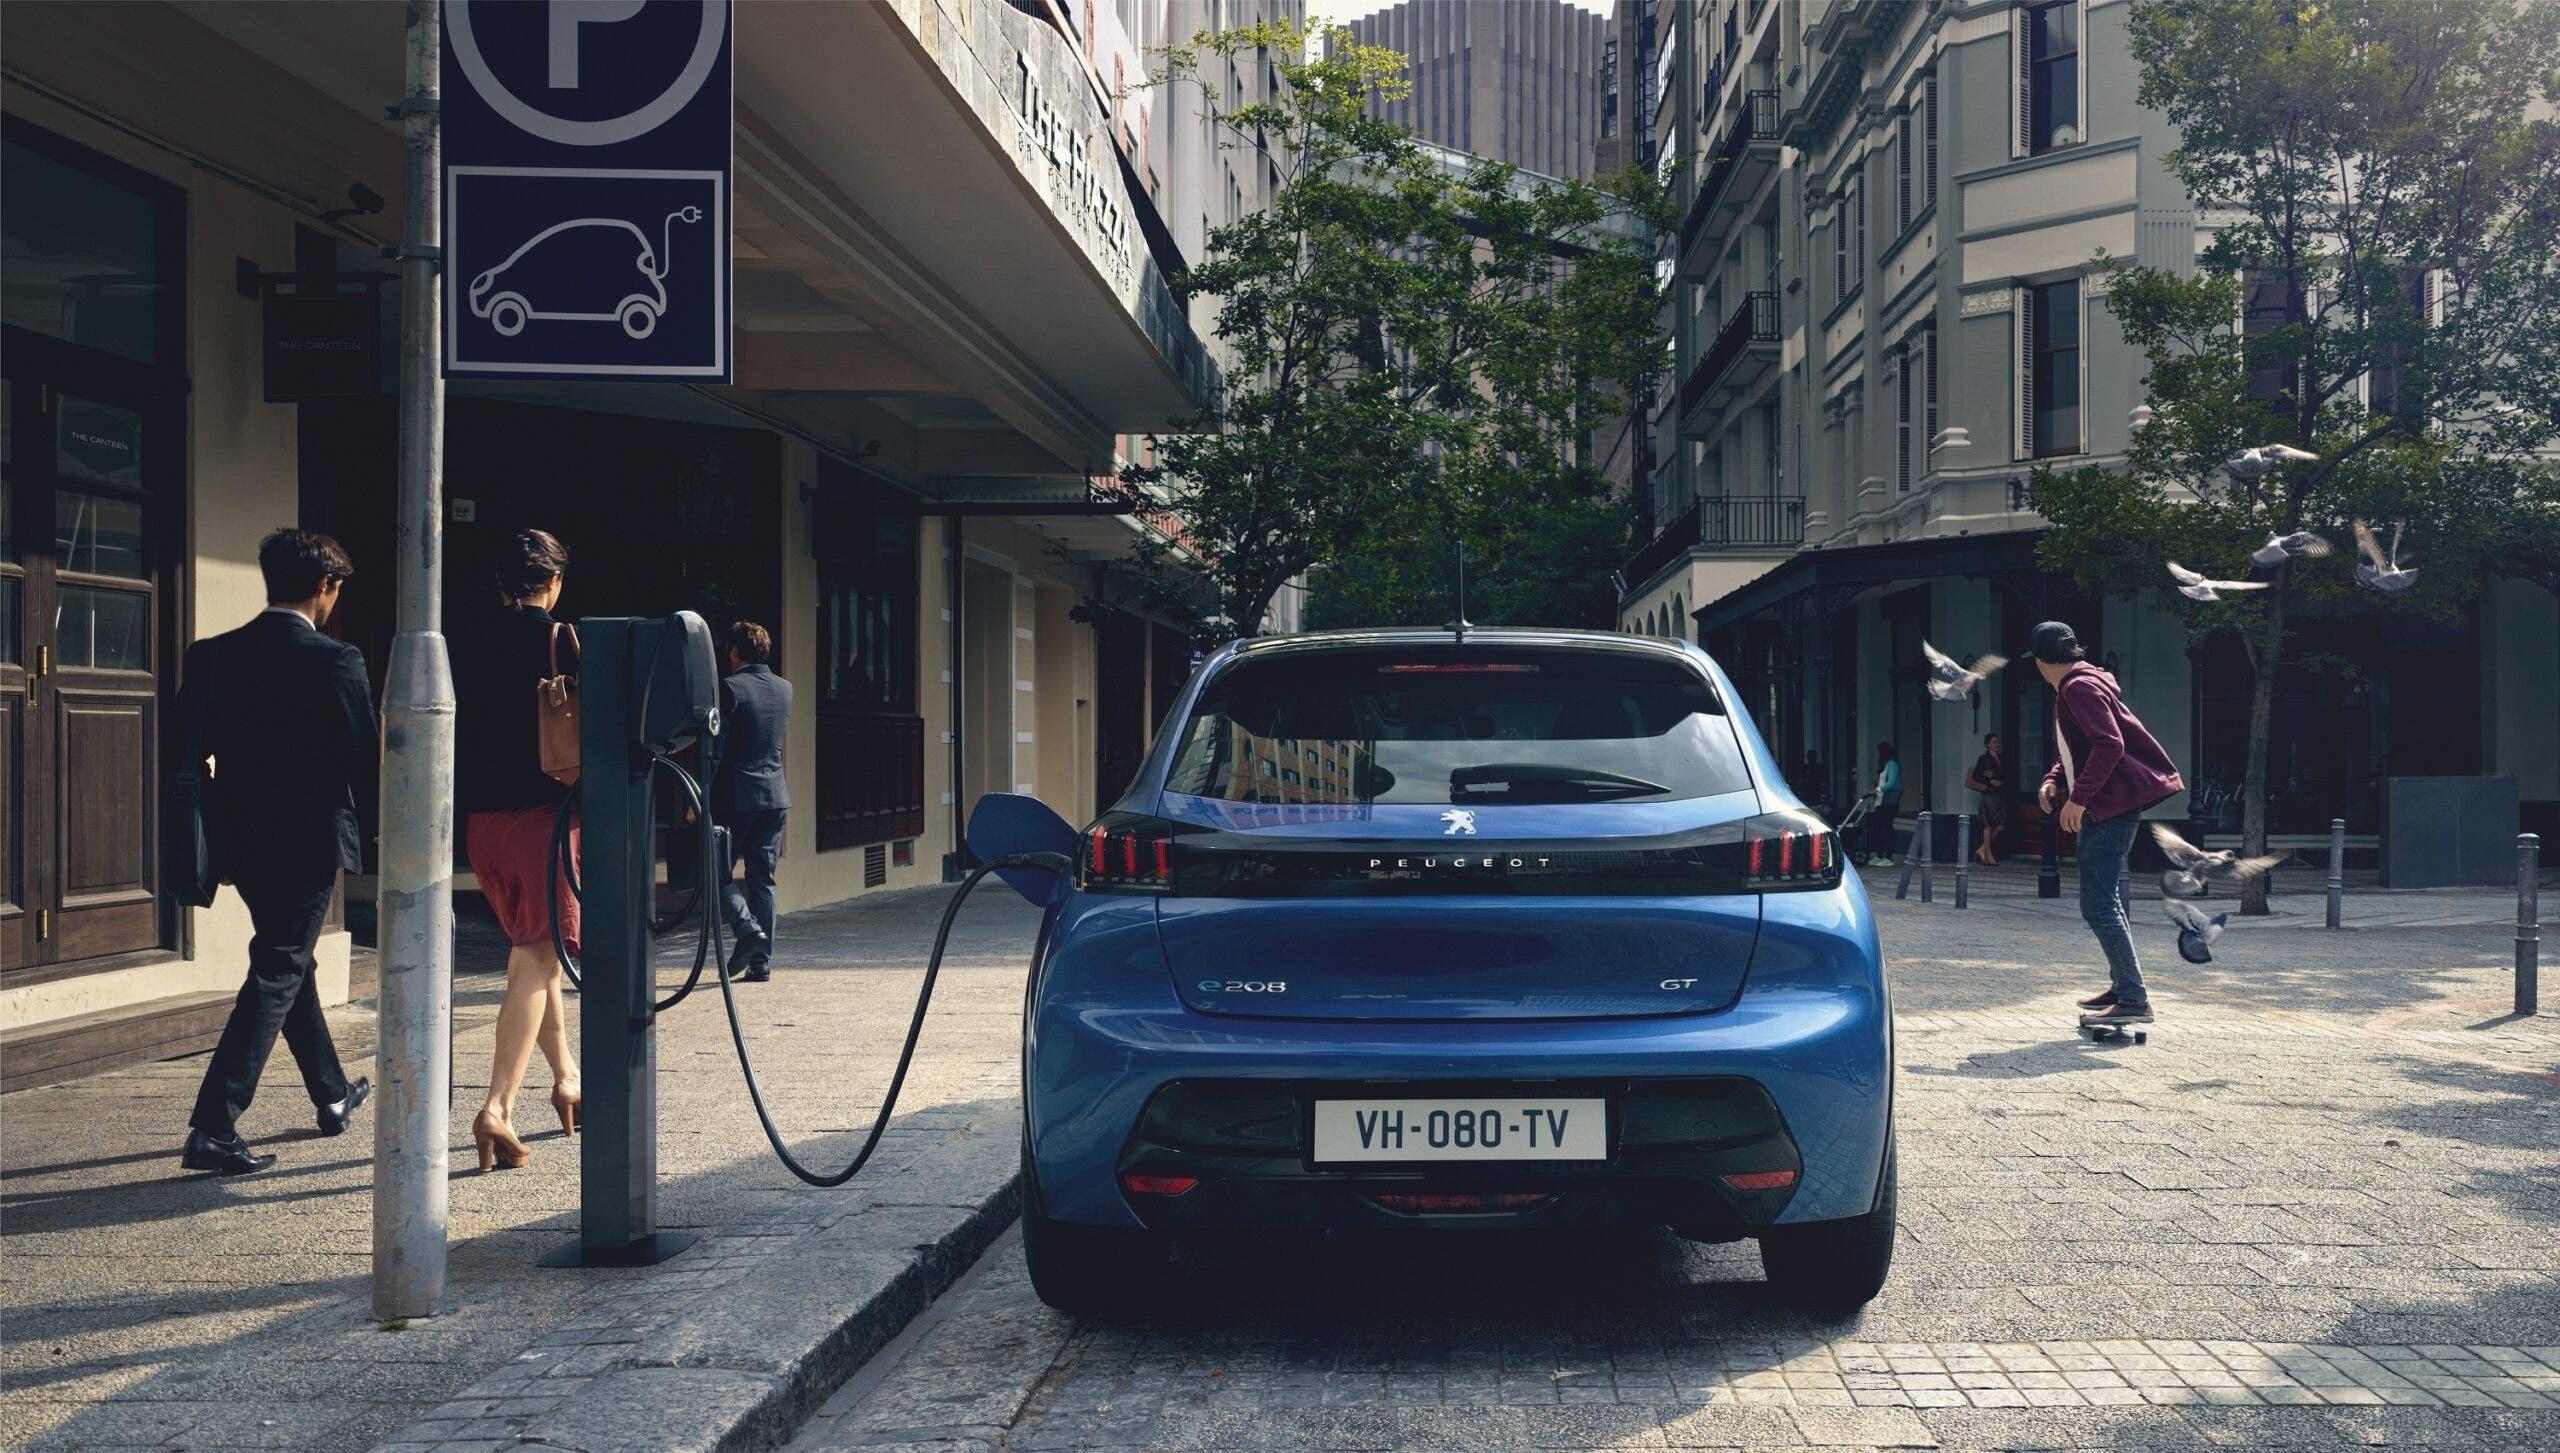 Peugeot wallbox LEV